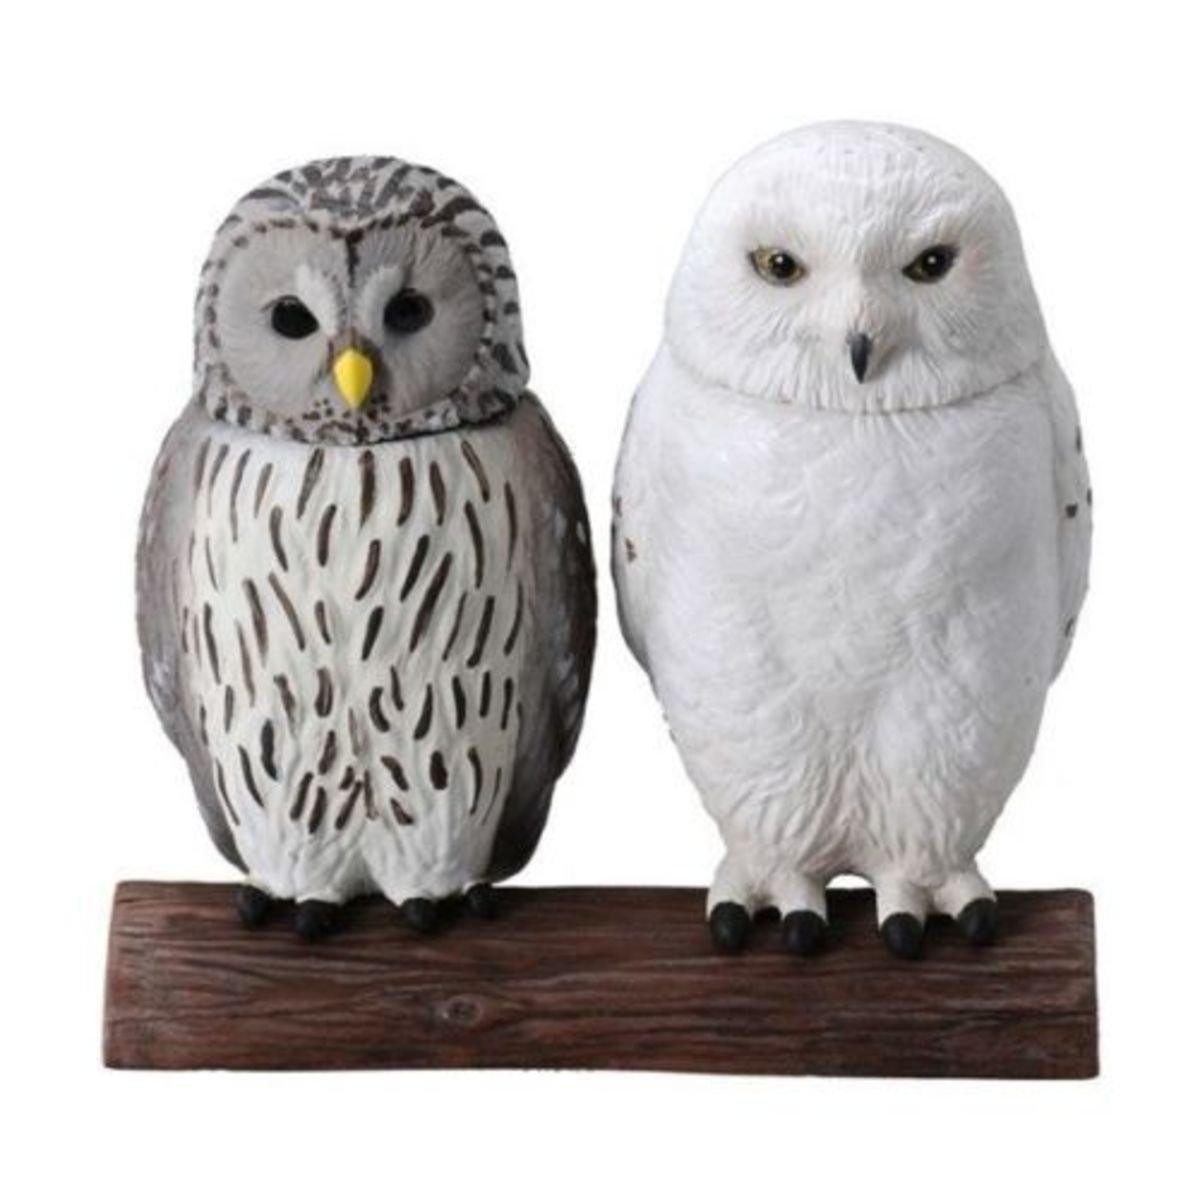 Ania Figure 探索動物系列 AL-12白貓頭鷹 &貓頭鷹 一套2款